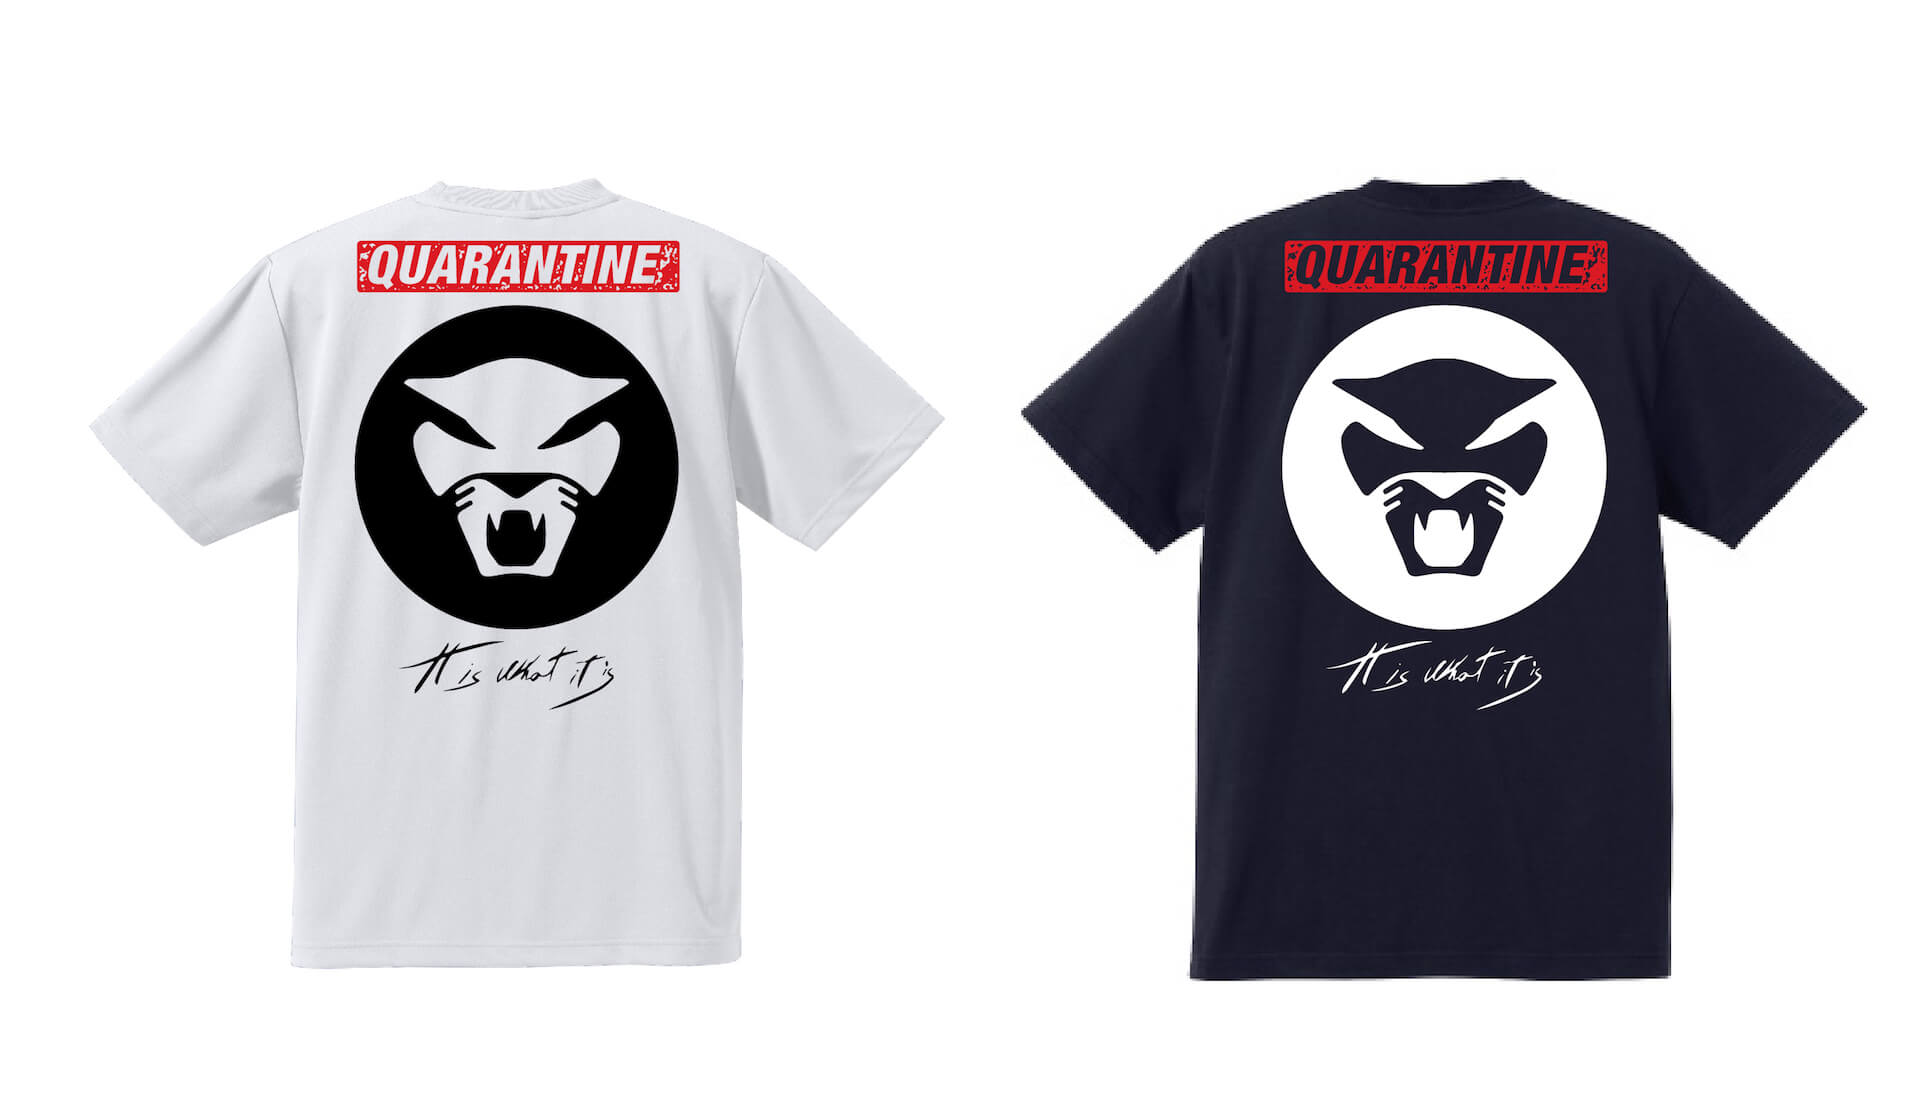 Thundercatがツアー延期Tシャツを発売!最新作『It Is What It Is』は自身初のオリコンチャートトップ10入り music200407_thundercat_tshirt_6